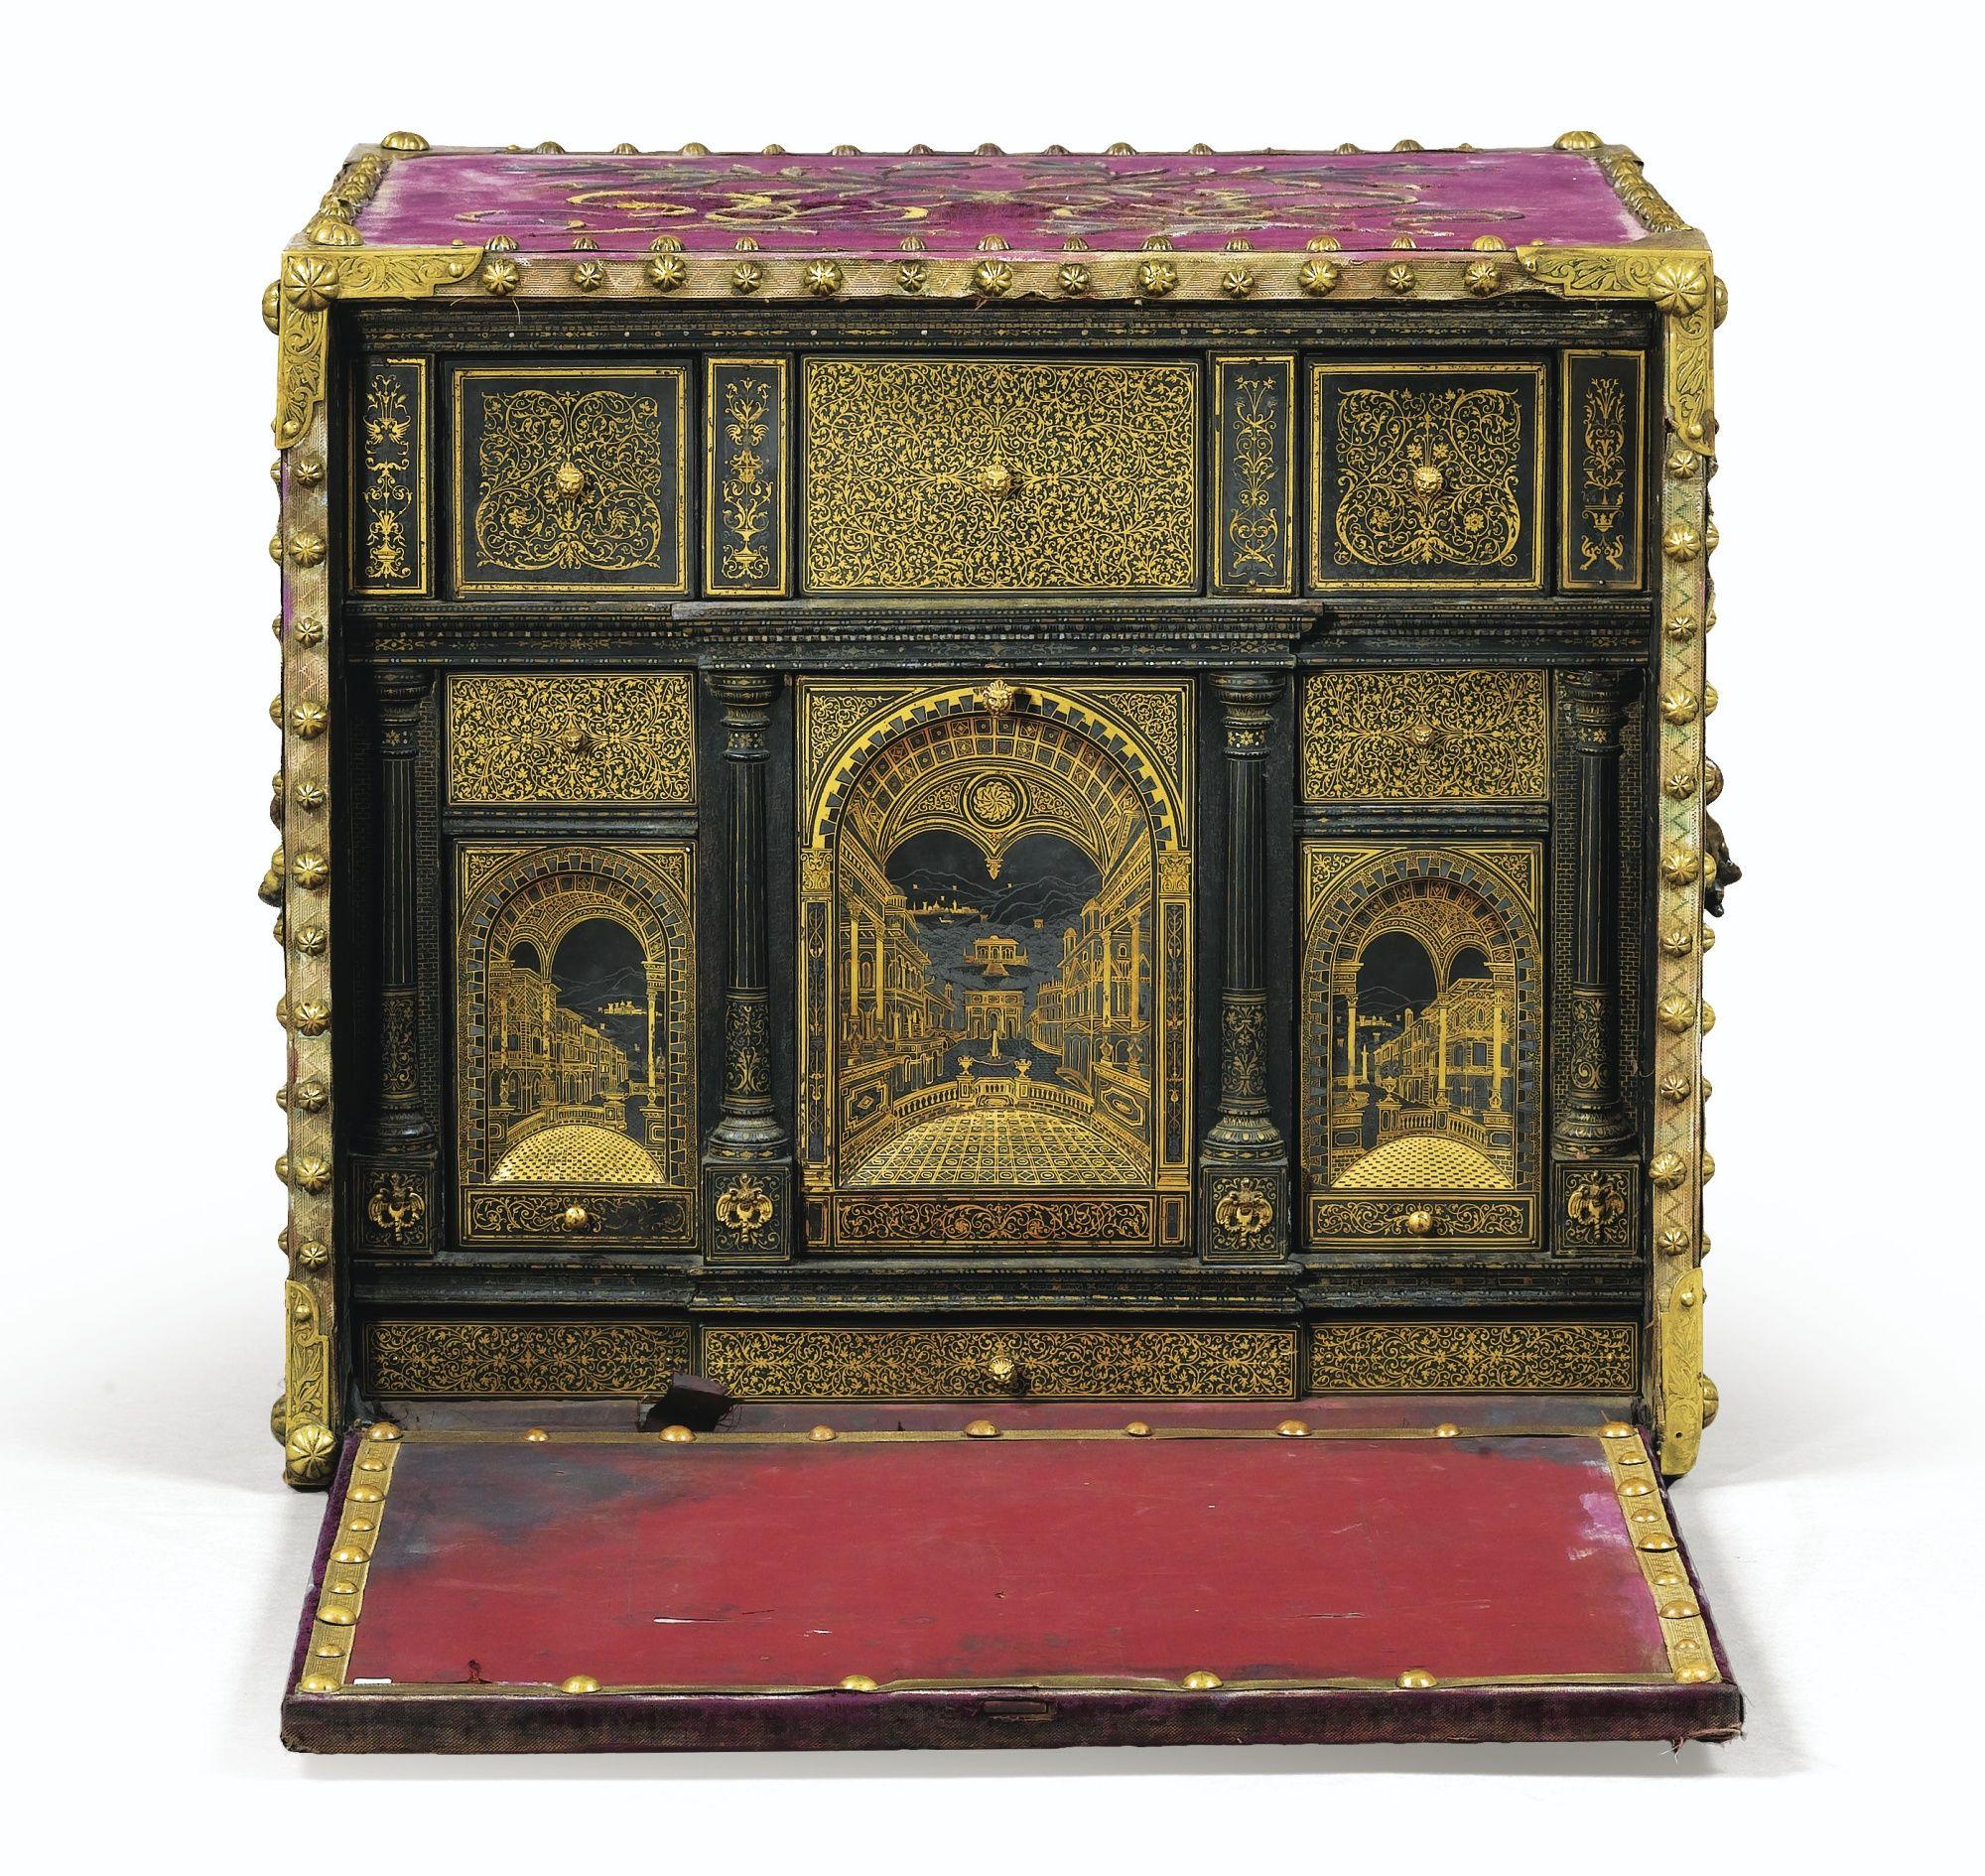 A Writting Cabinet Probably South German Partly Early 16th Century Boites Anciennes Mobilier De Salon Objet De Curiosite